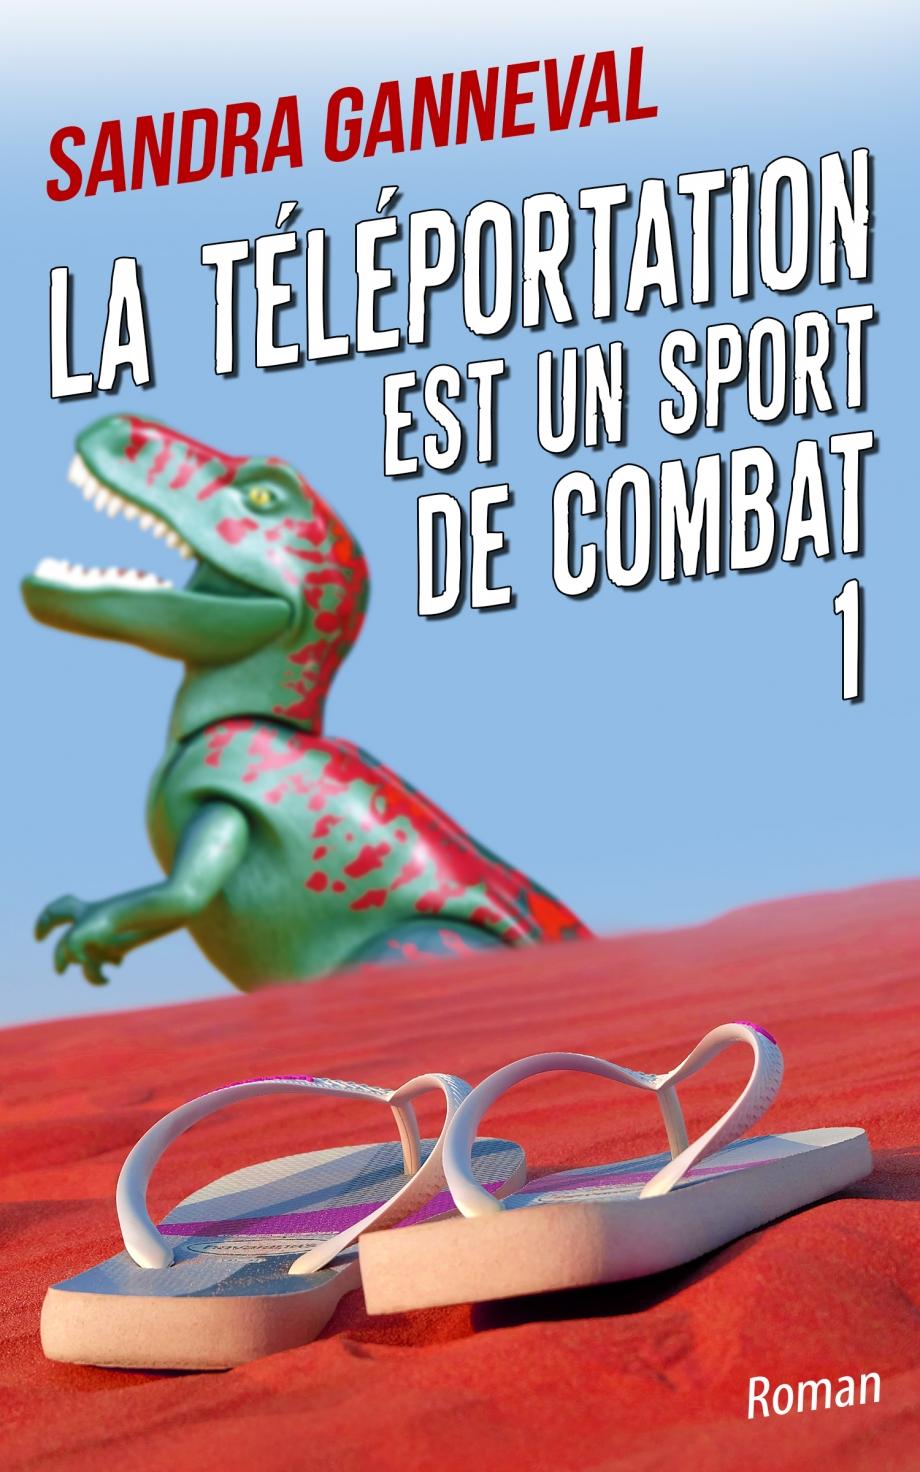 C1-Teleportation-127x2032.jpg